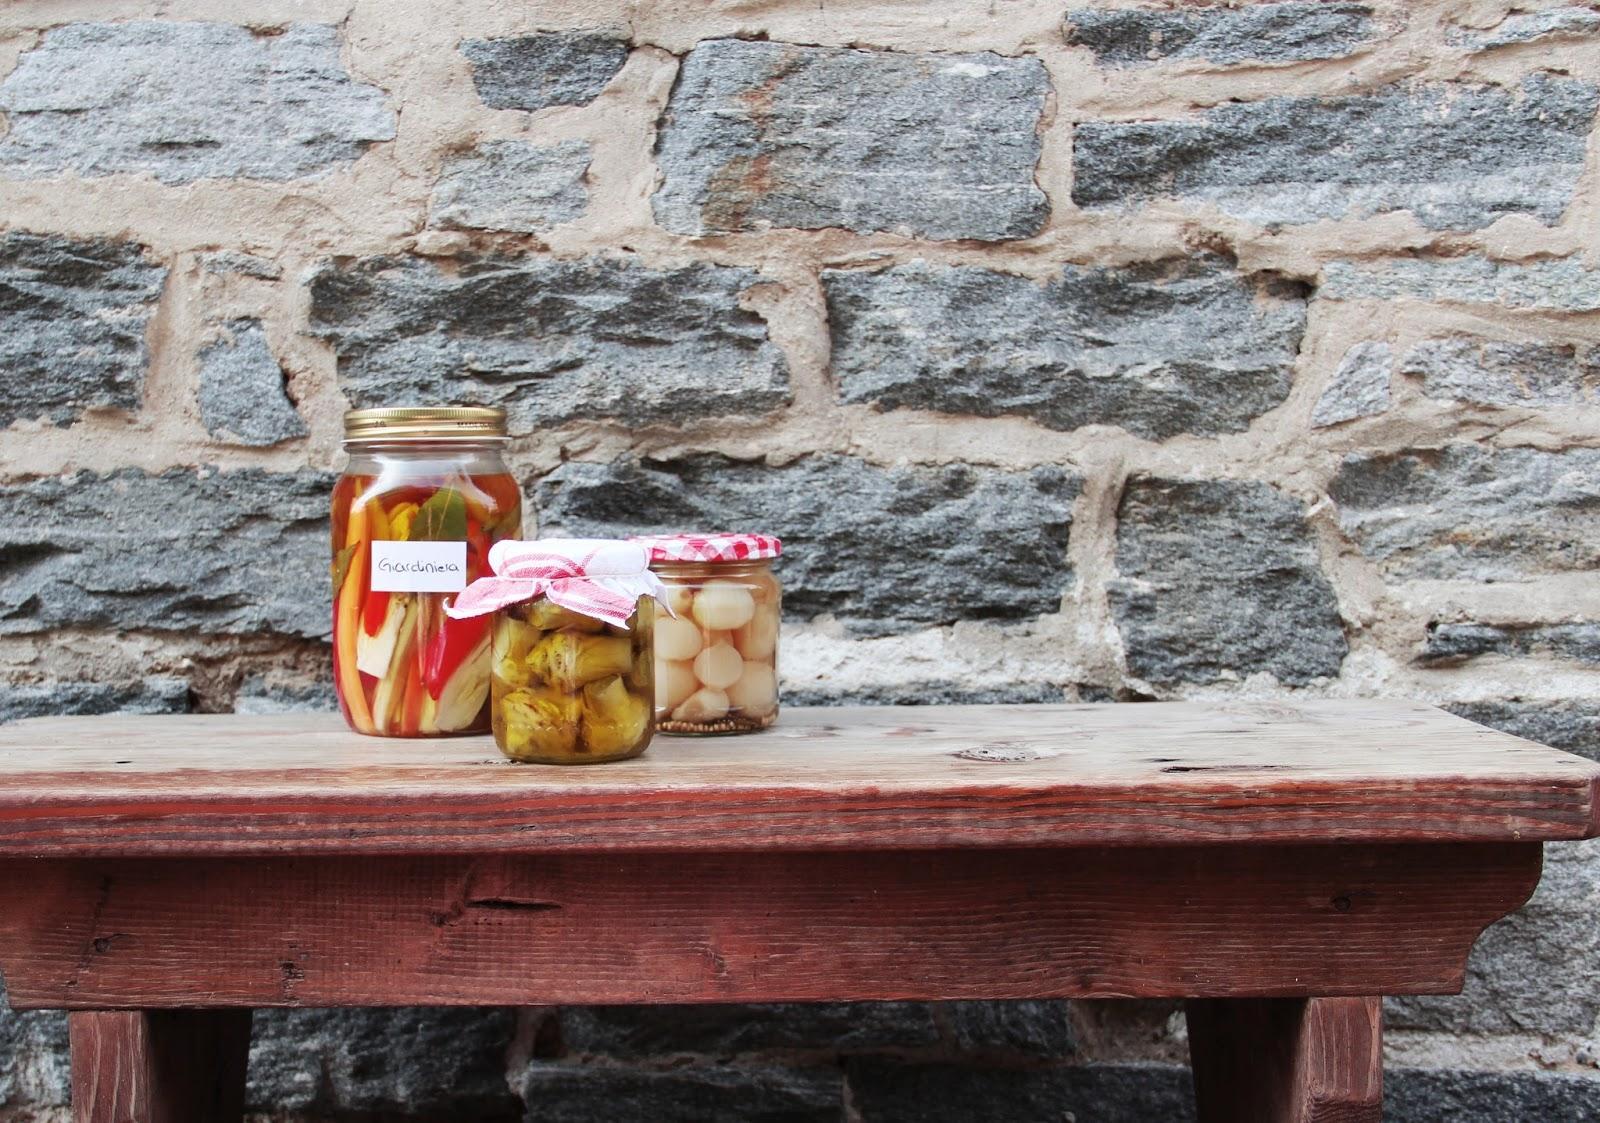 giardiniera - italian pickled vegetablesItalian Pickled Vegetables